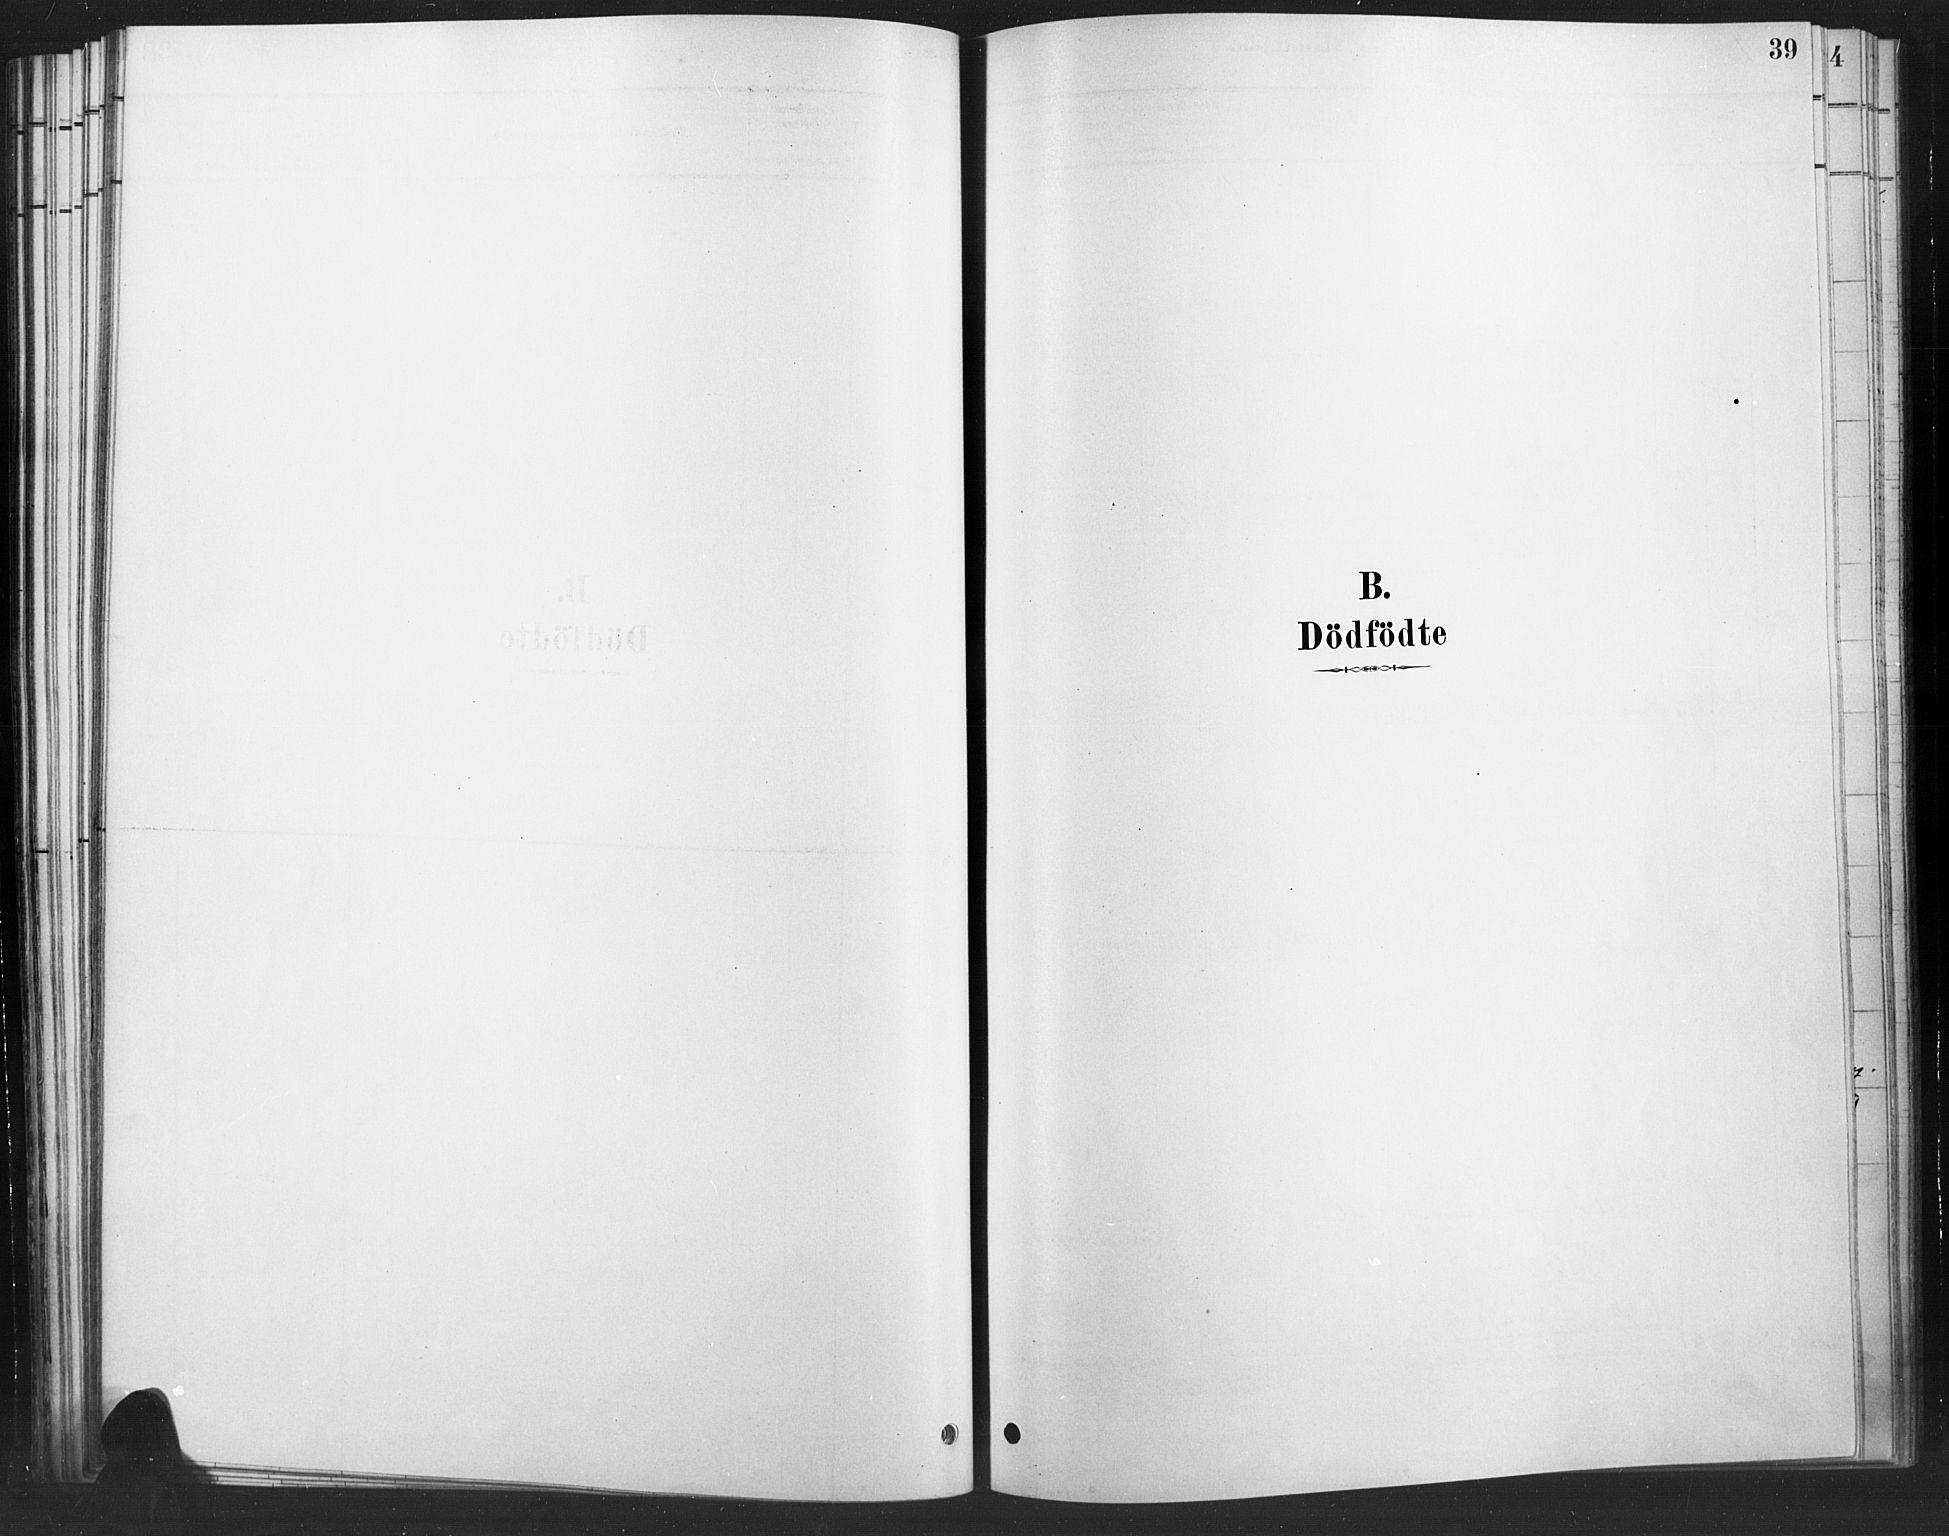 SAH, Ringebu prestekontor, Ministerialbok nr. 10, 1878-1898, s. 39